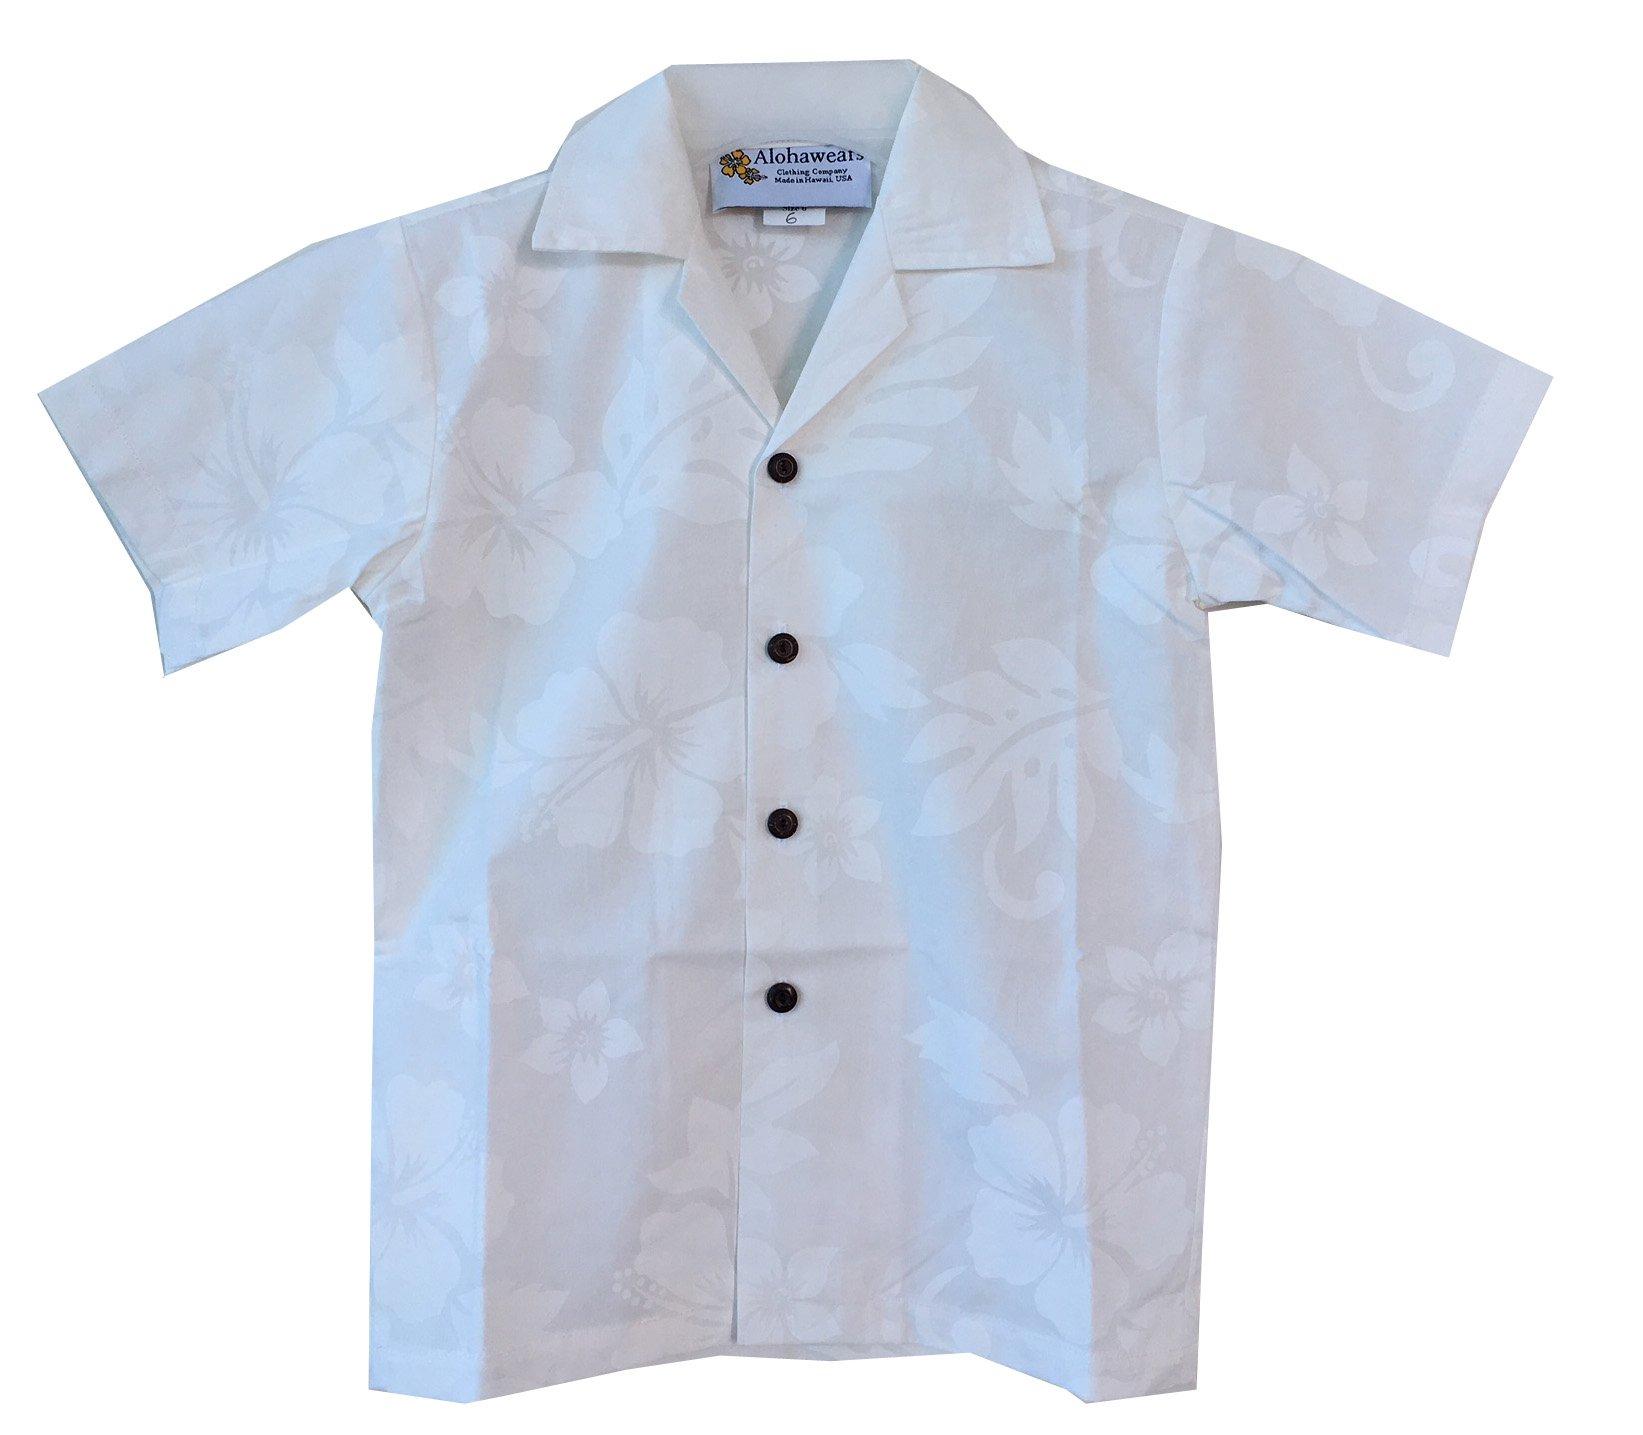 Alohawears Clothing Company Boy's White Wedding Cruise Luau Hawaiian Aloha Shirt (8, White/White)